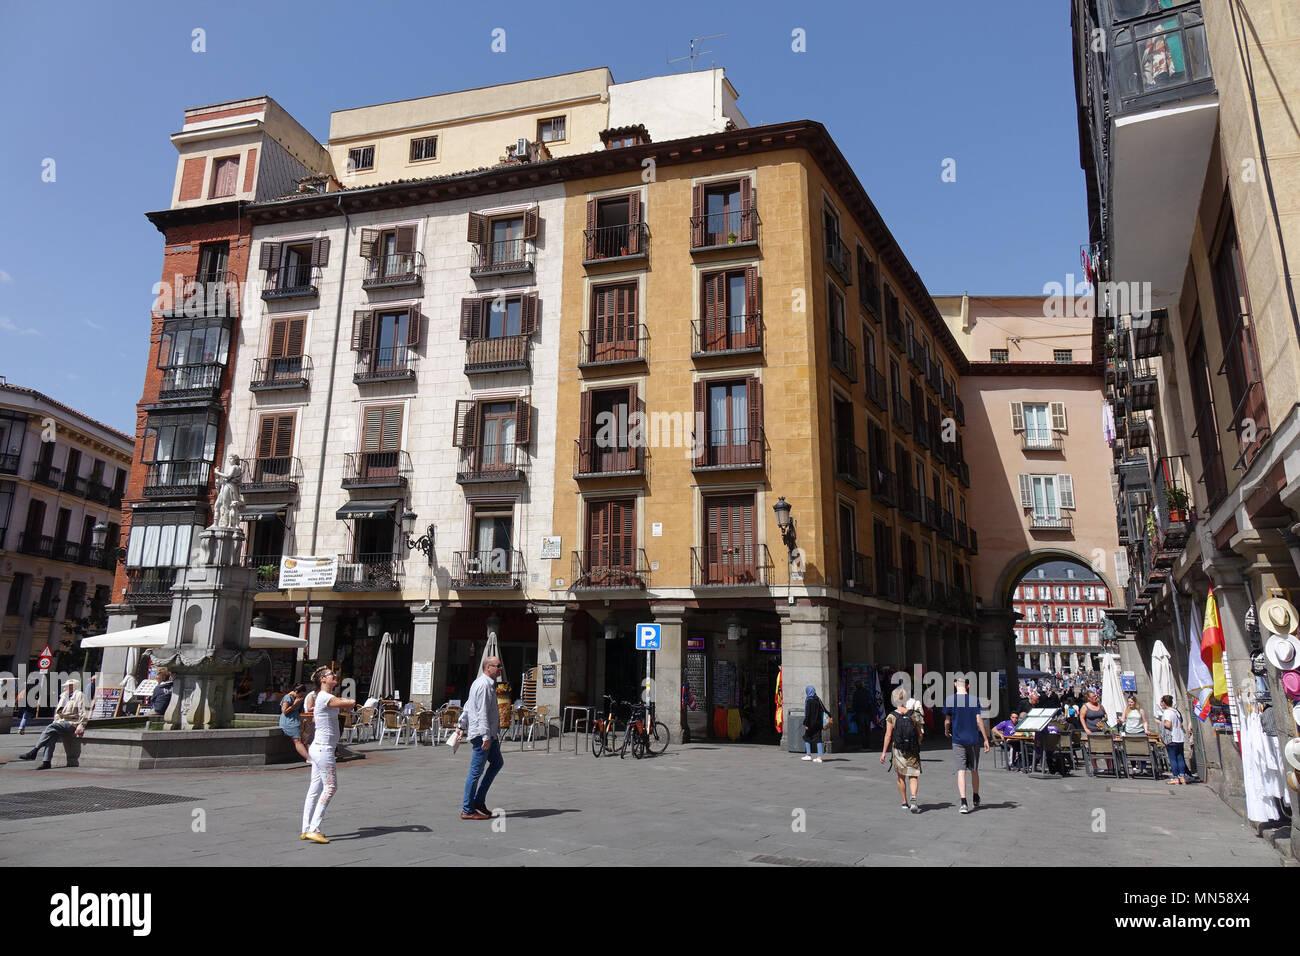 Plaza de la provincia, Madrid Imagen De Stock